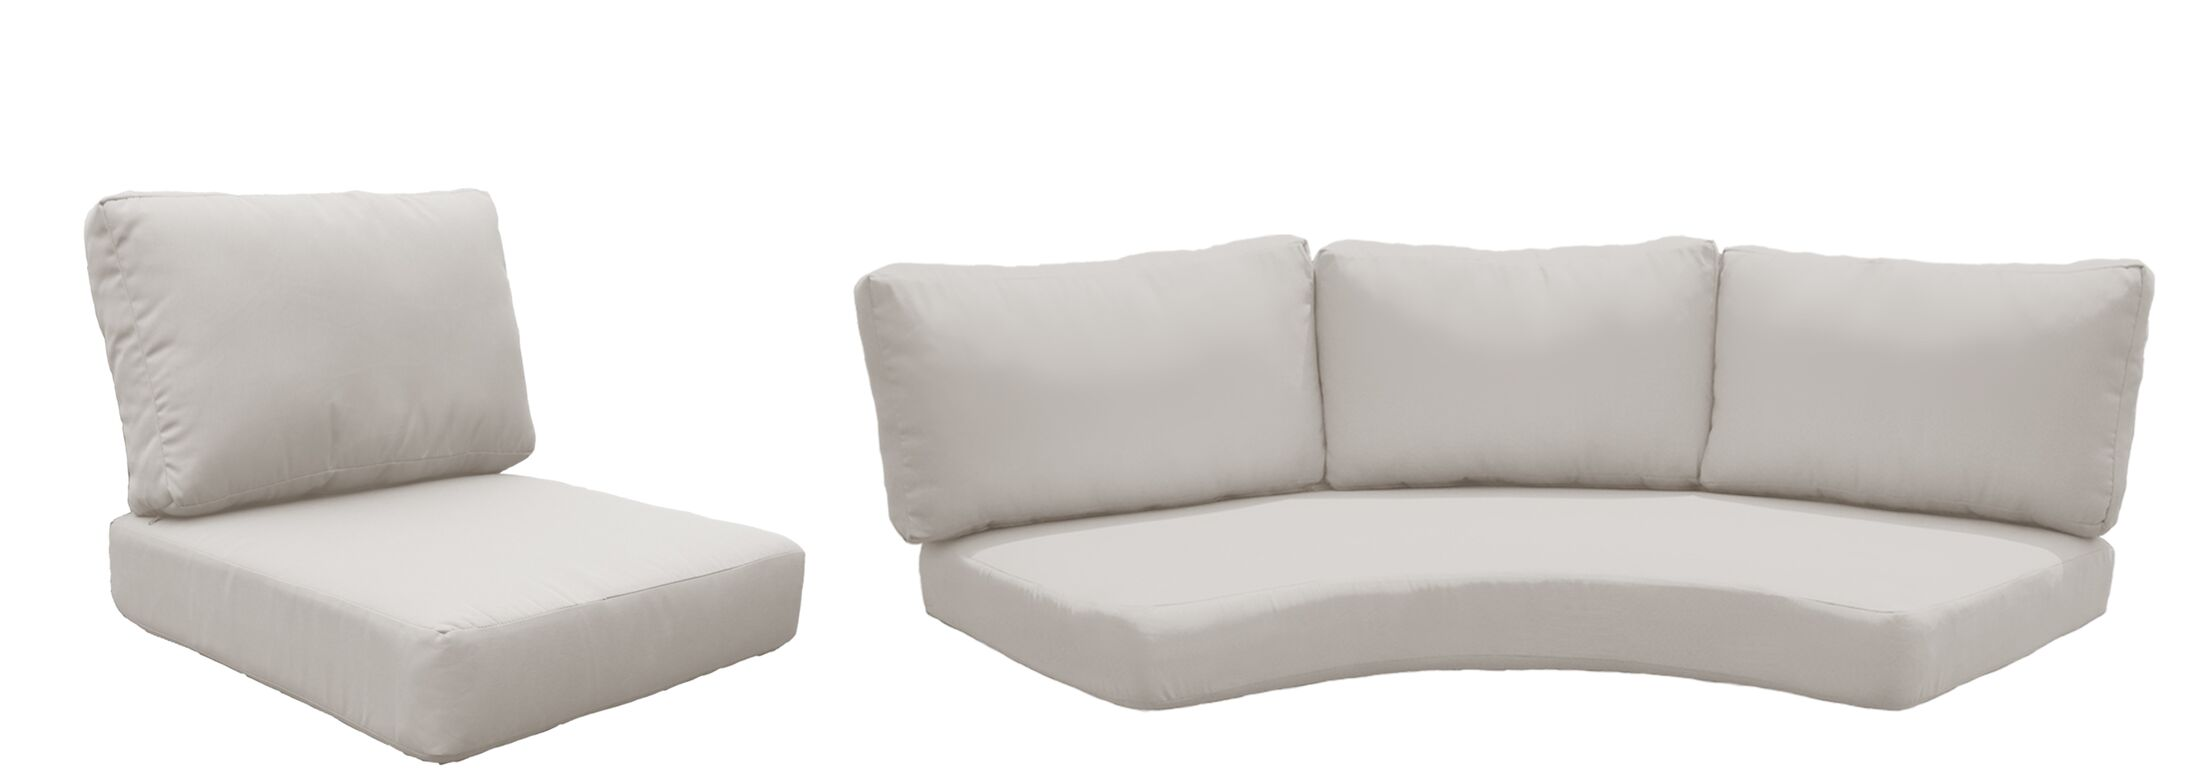 Fairmont 10 Piece Outdoor�Lounge Chair Cushion Set Fabric: Beige